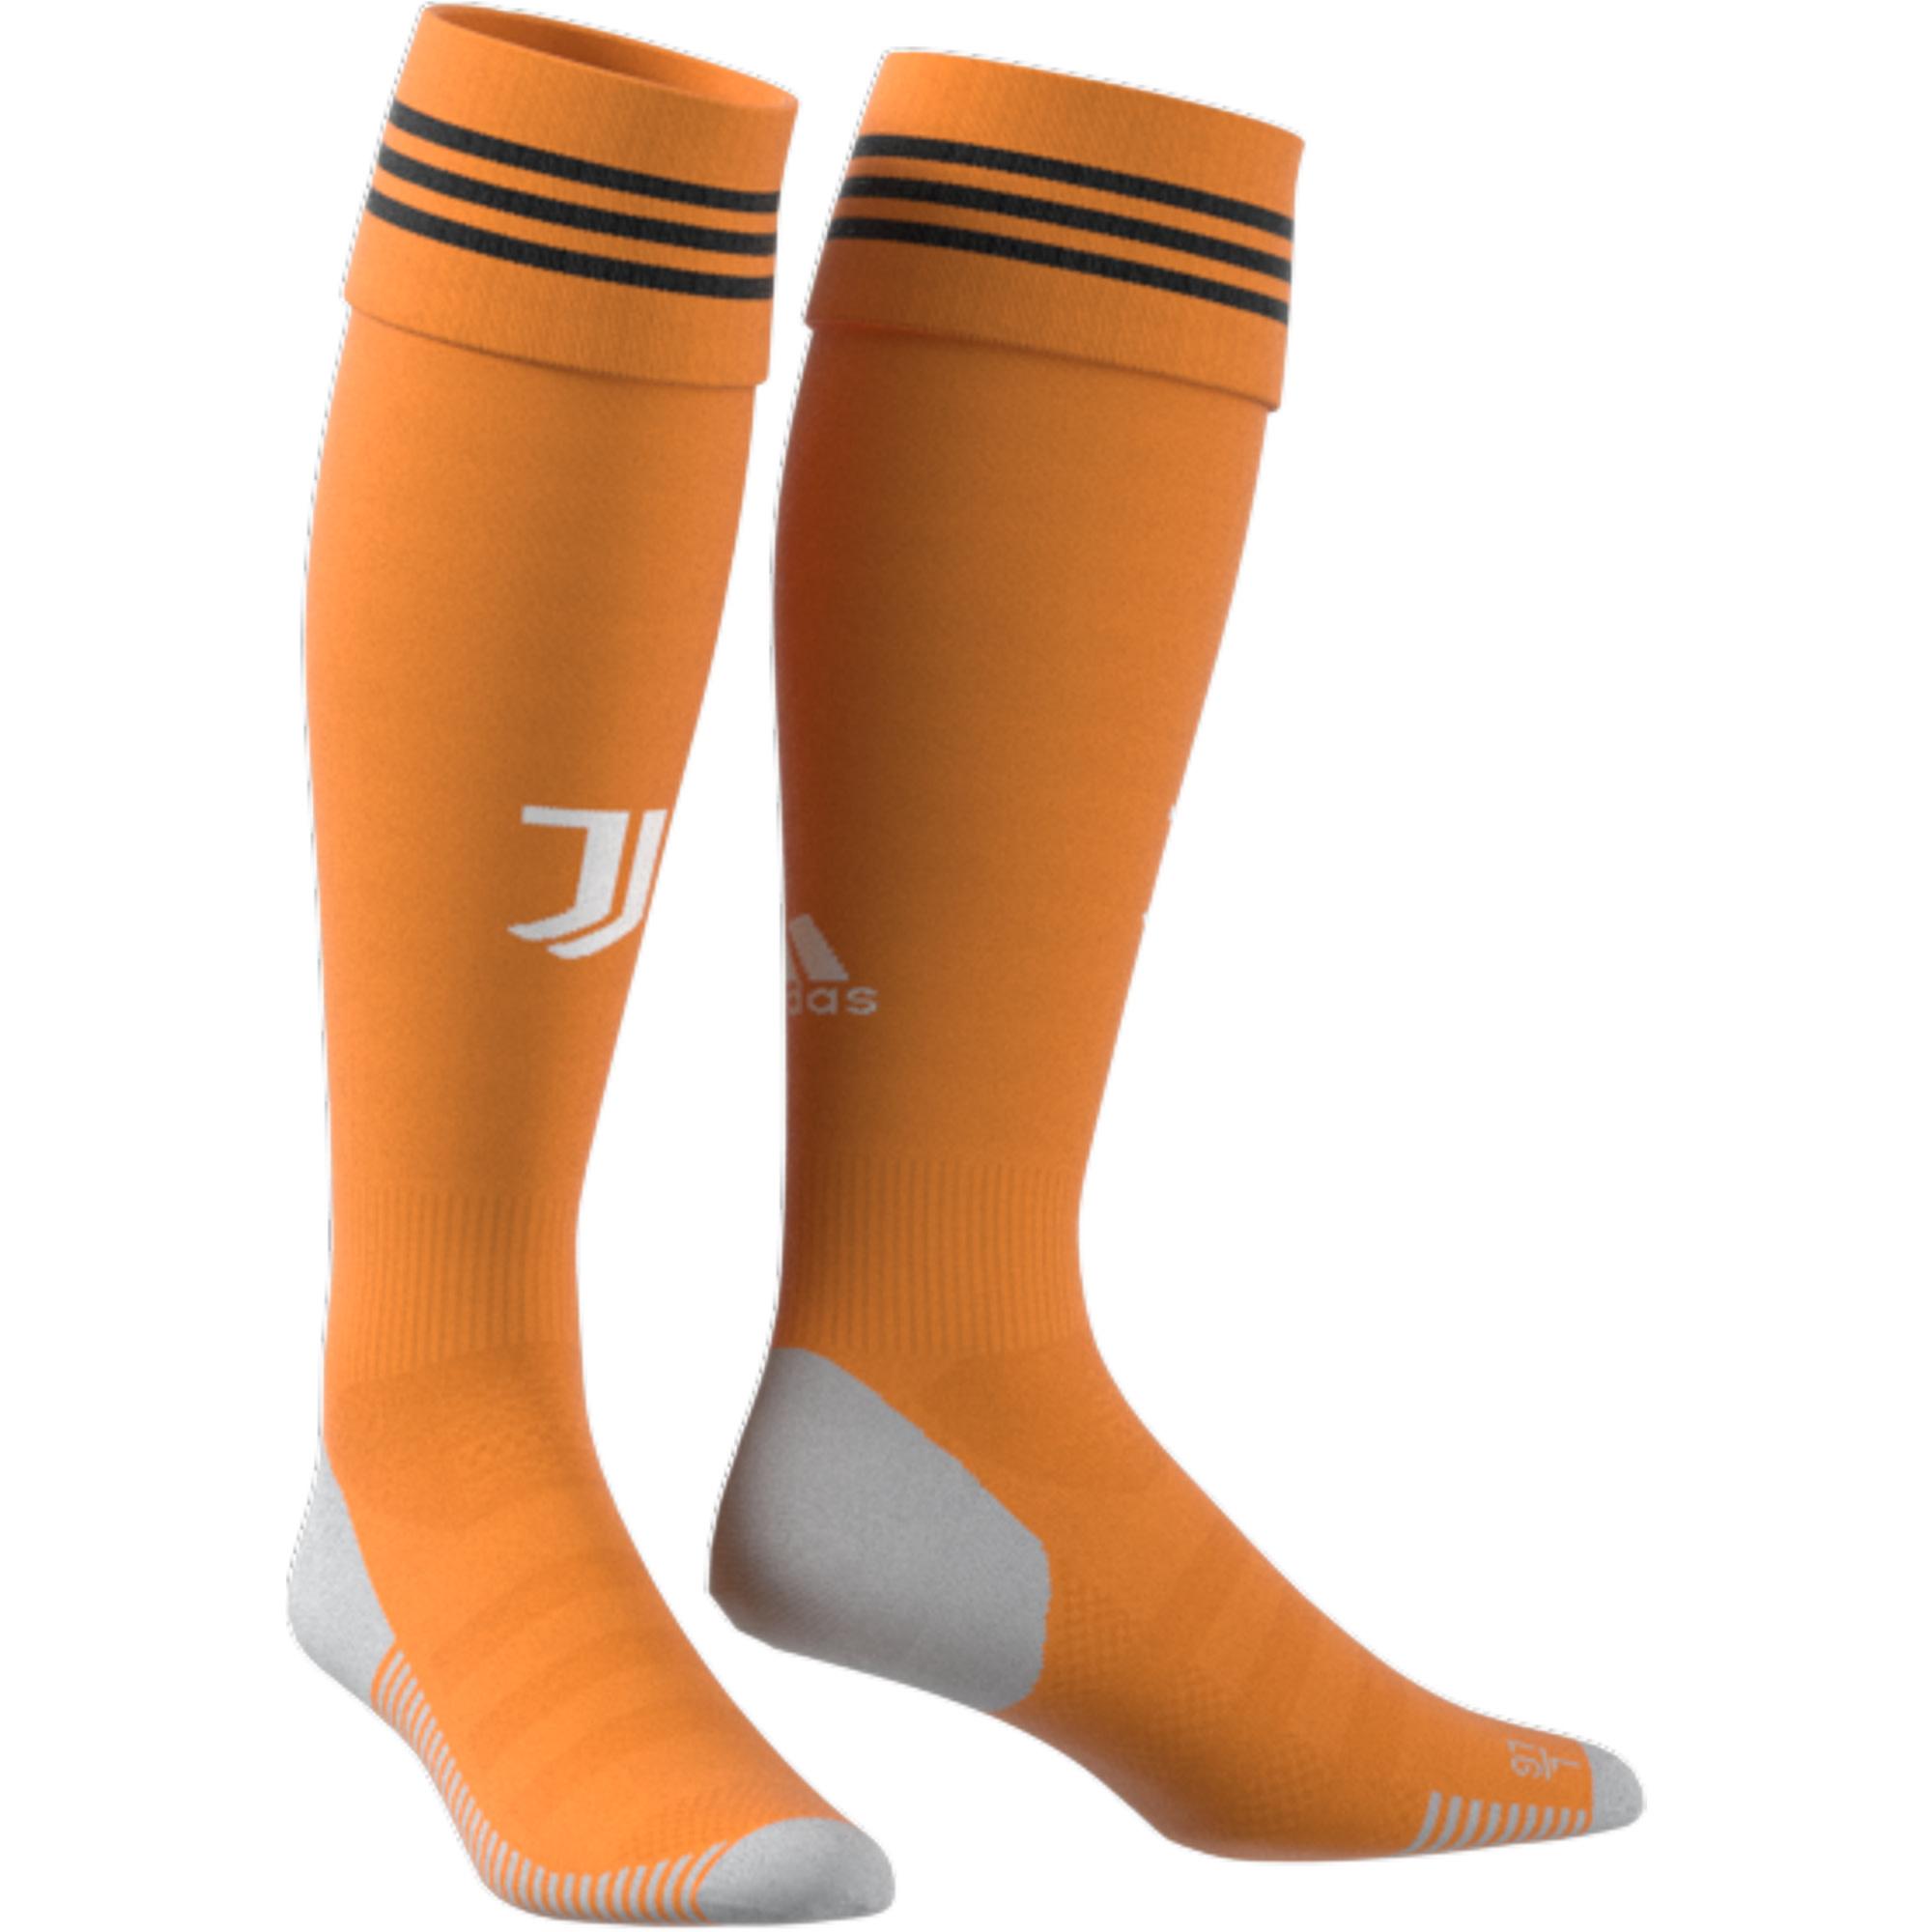 Adidas ADIDAS Juventus 3rd Sock '20-'21